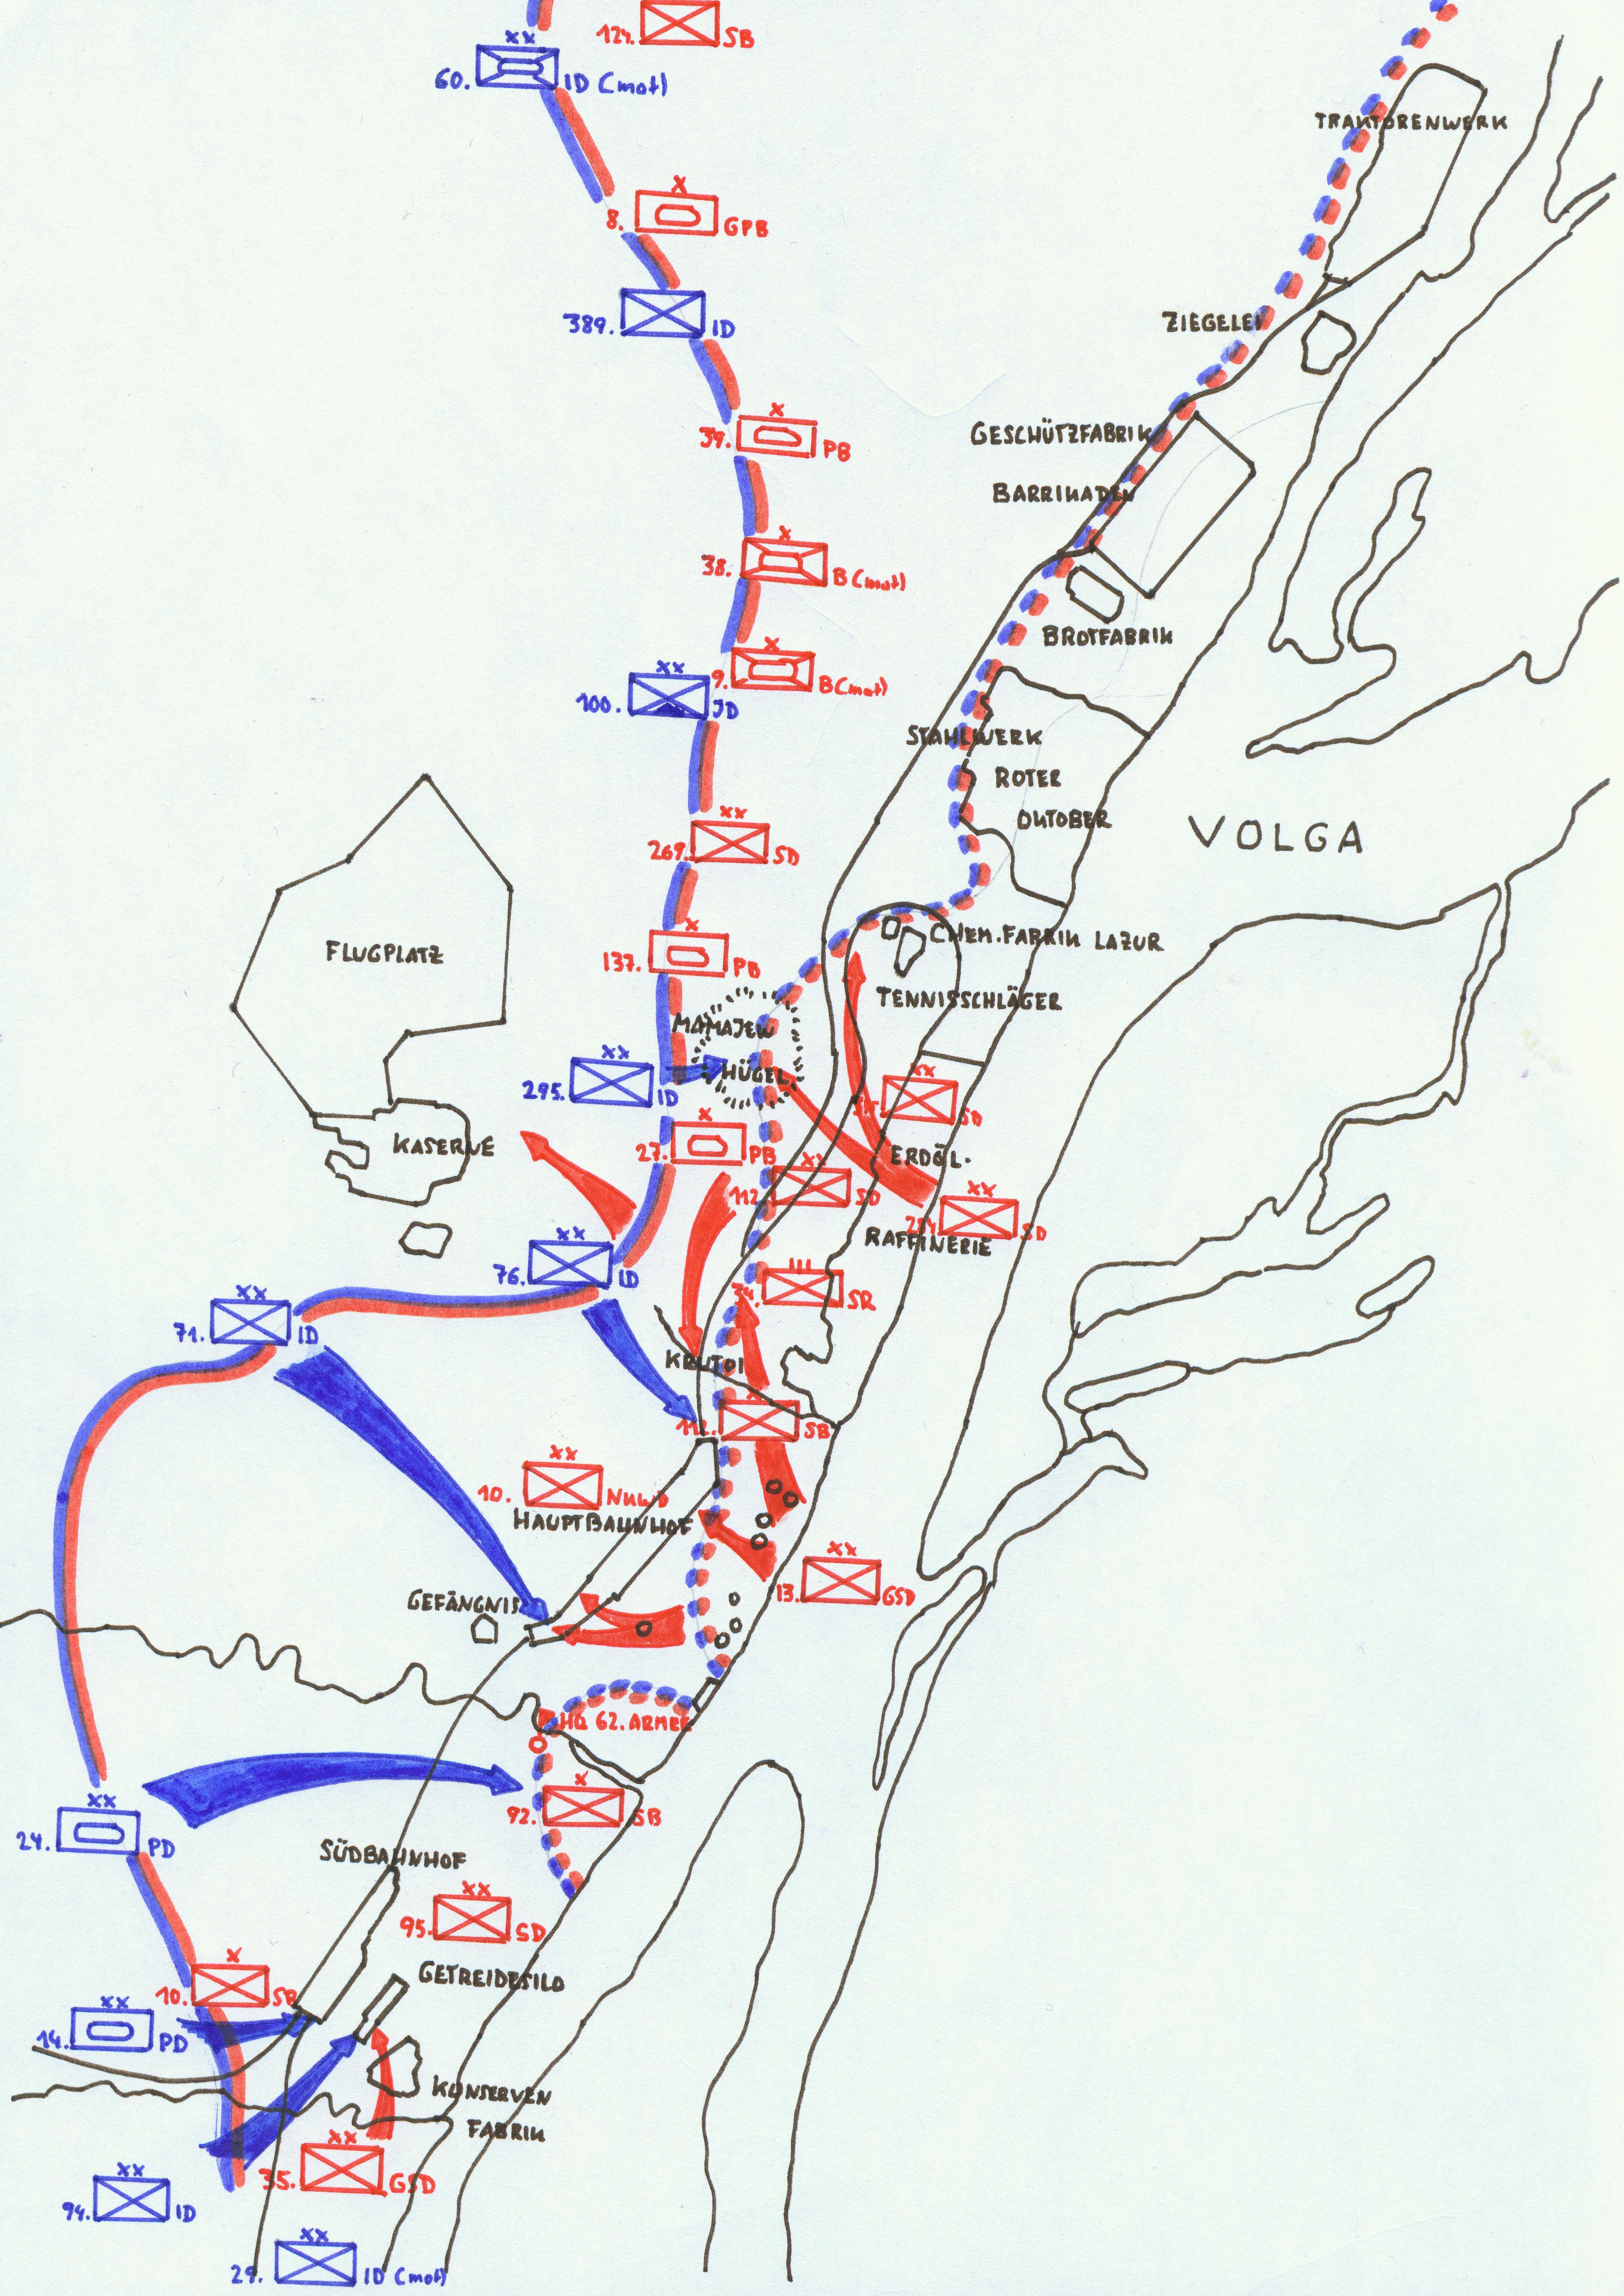 Schlacht Um Stalingrad Karte.Angriff Auf Stalingrad Wikipedia